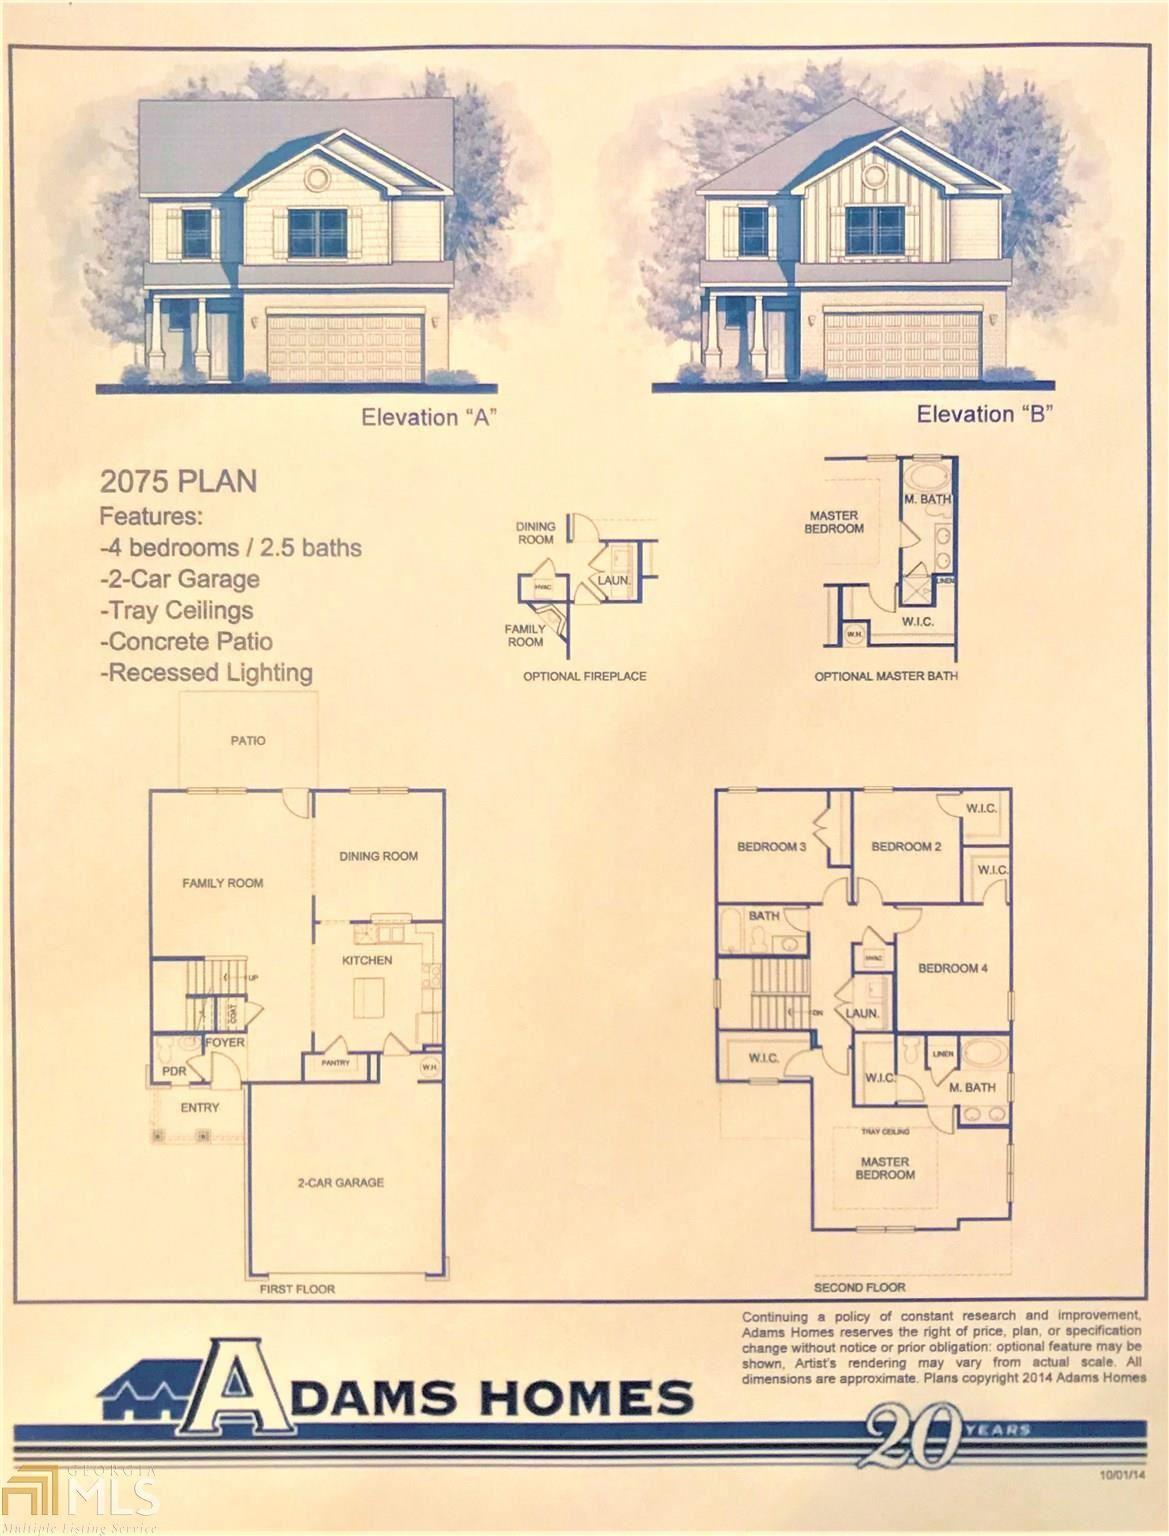 11920 Lovejoy Xing, Lovejoy, GA 30250 - MLS#: 8889931